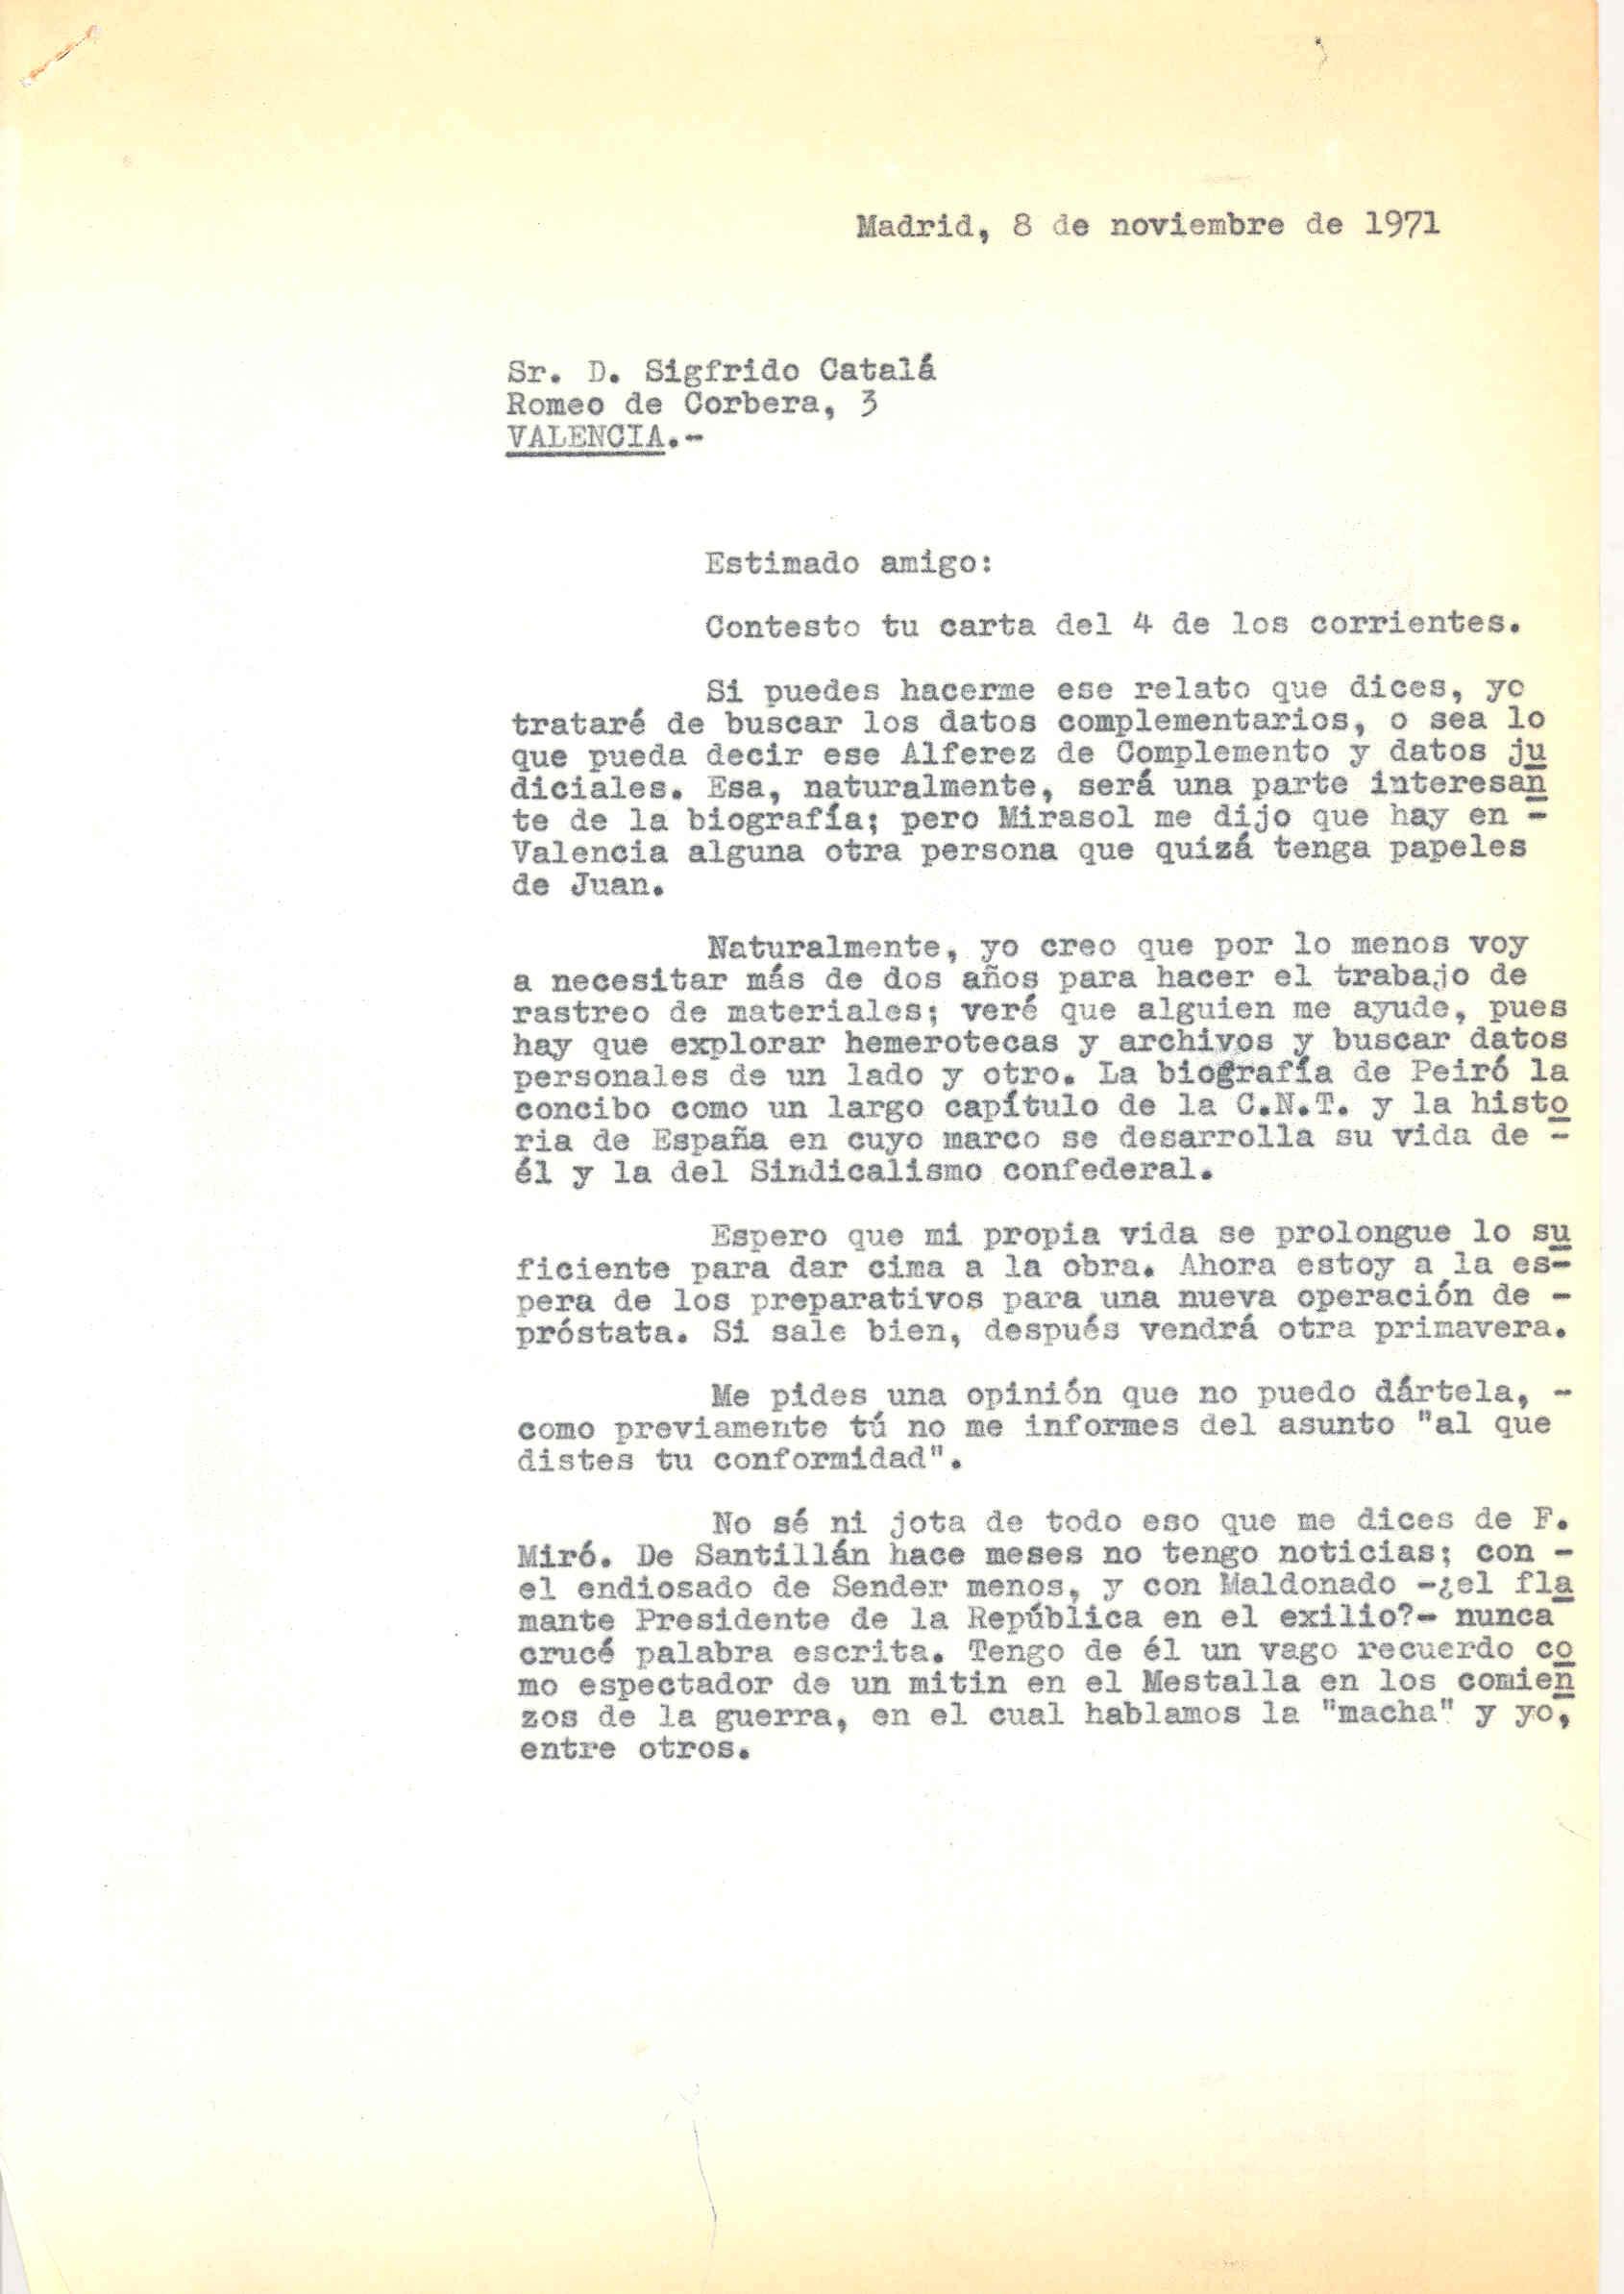 Visor Archivo General Región de Murcia. JLS,991/5,16 / Carta a ...